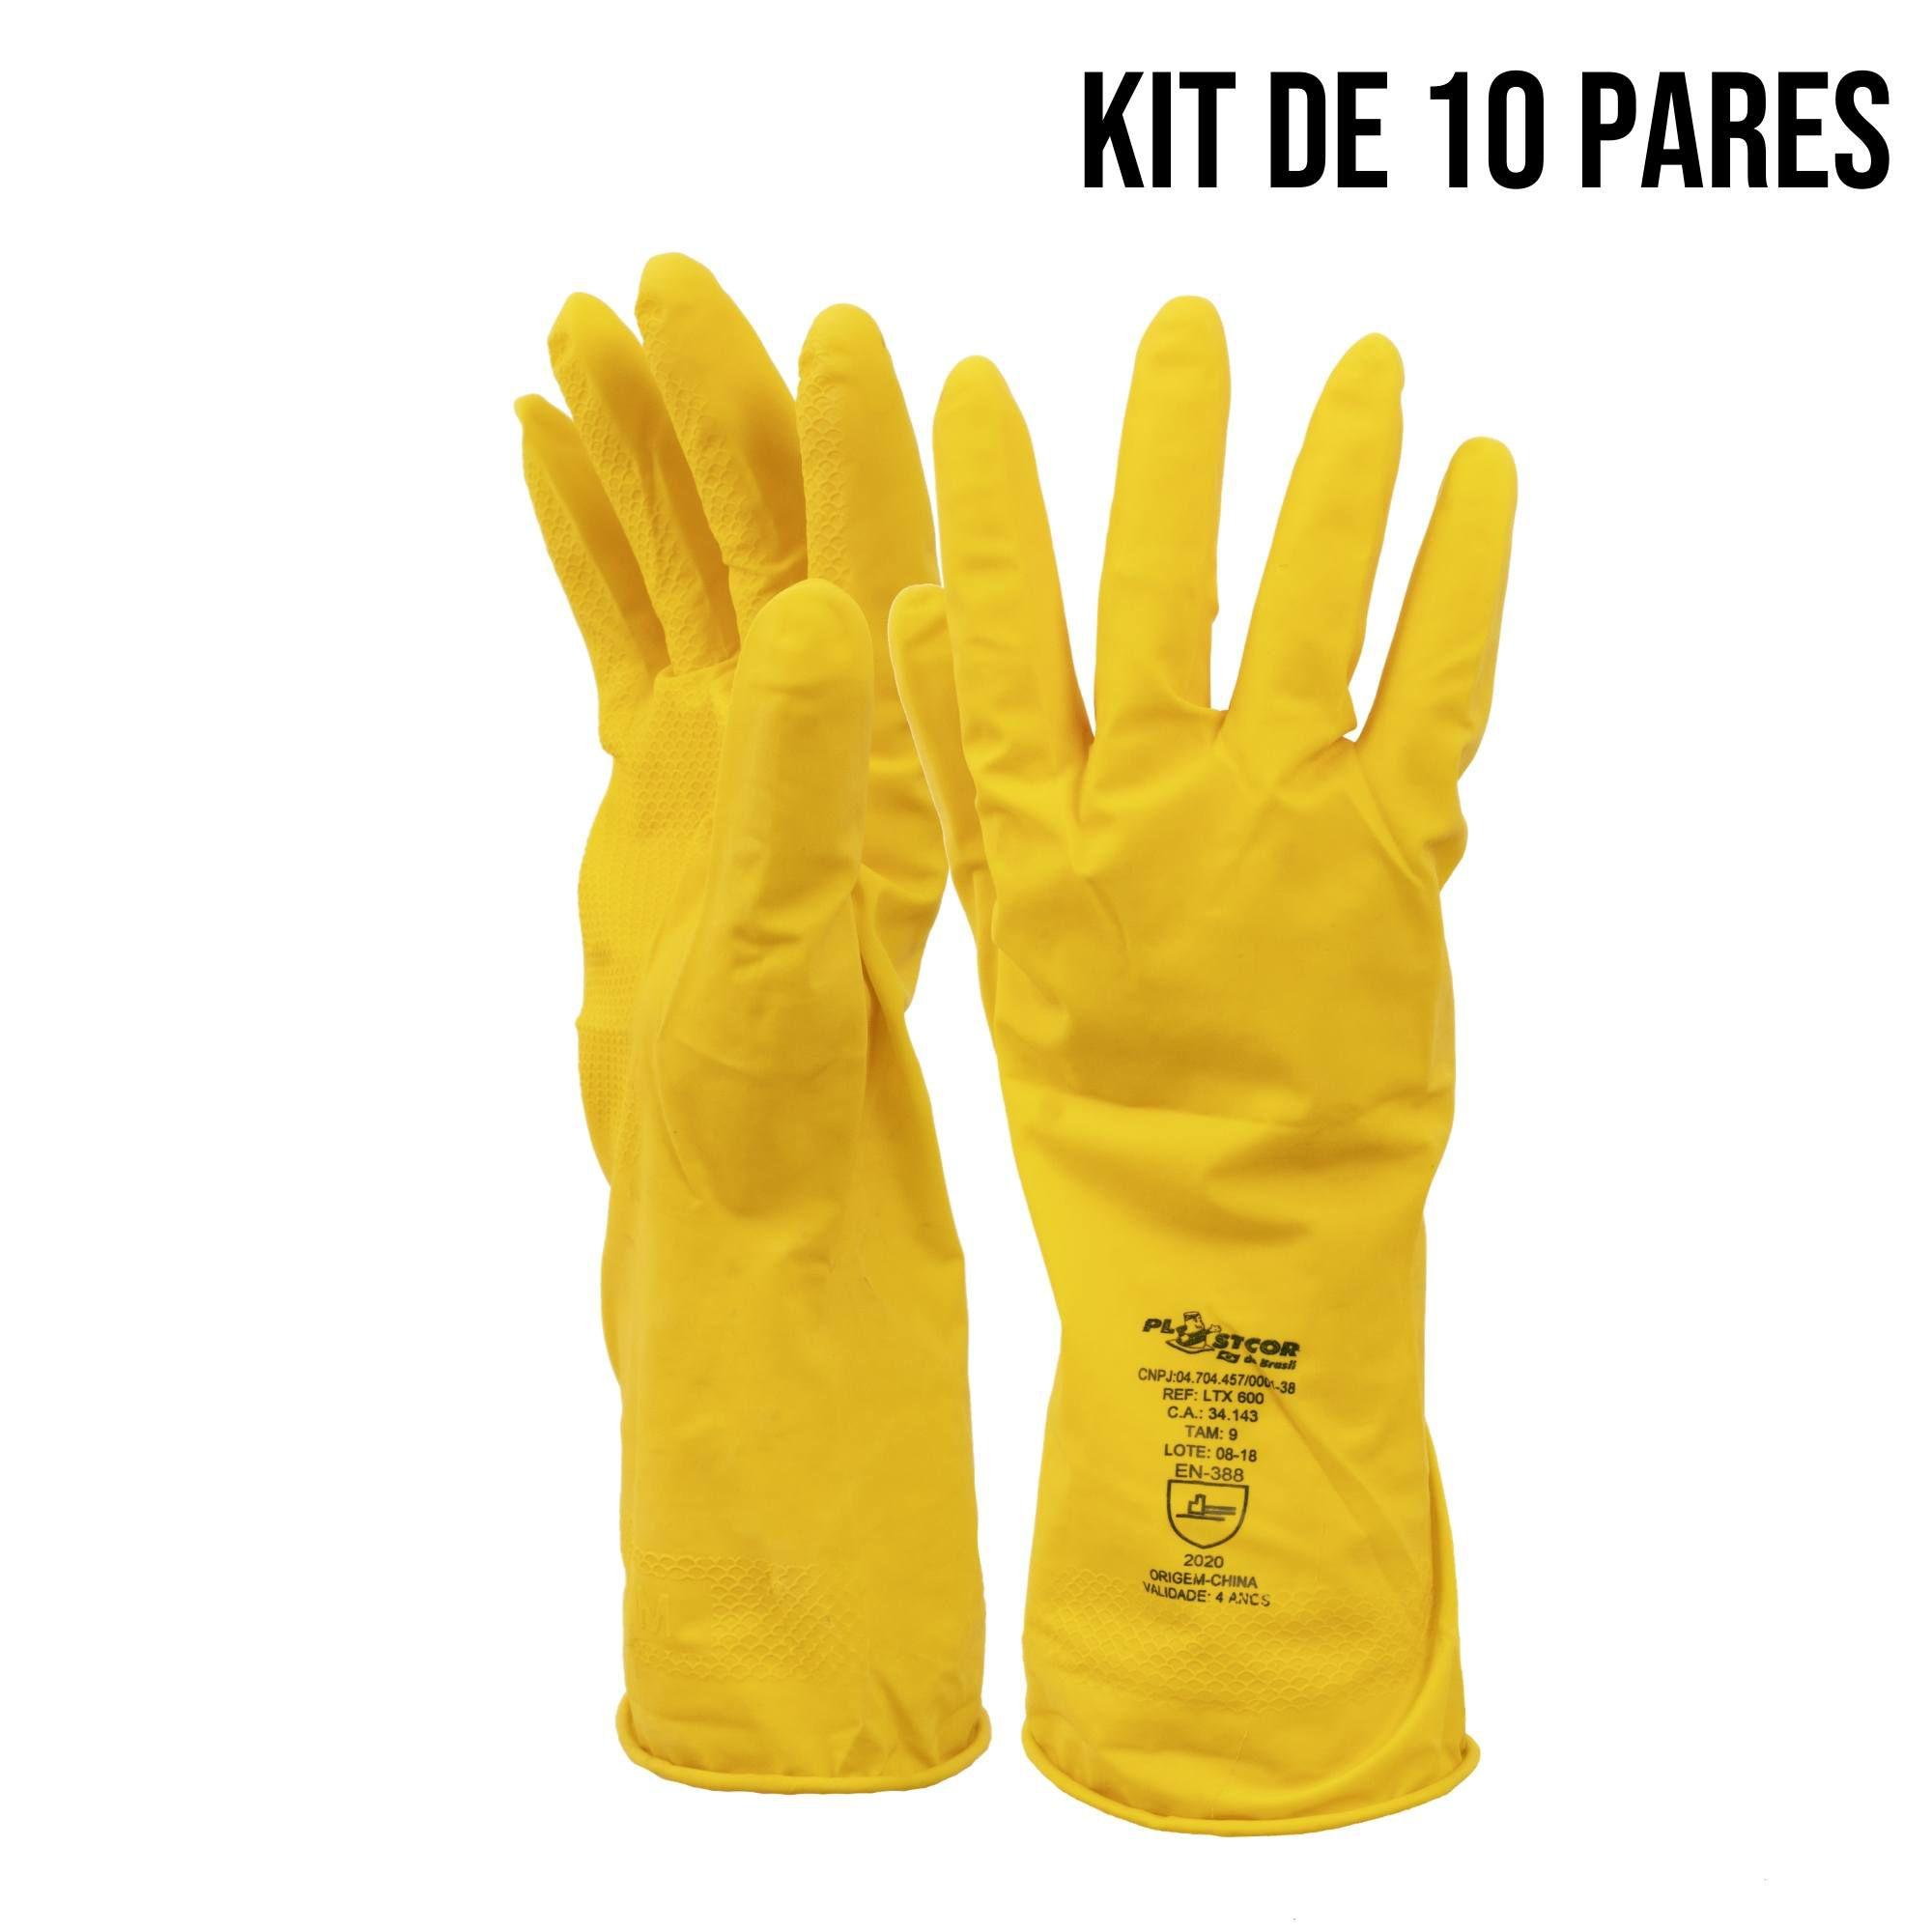 kit 10 pares luva latex amarela acabamento liso ltx limpeza - C.A. 34143  - DE PAULA EPI